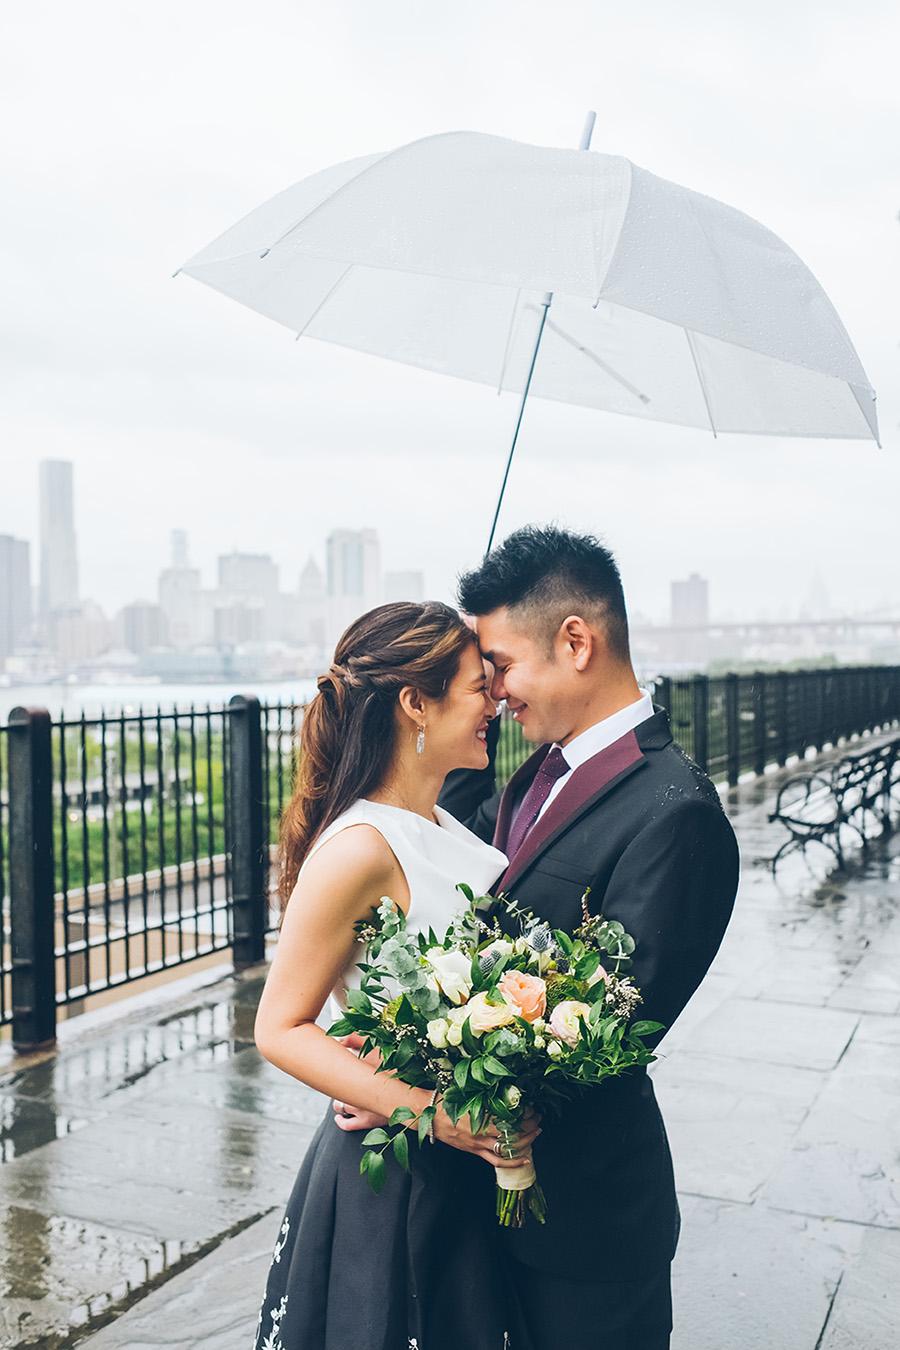 NEW-YORK-CITY-WEDDING-PHOTOGRAPHER-INTIMATE-WEDDING-ELOPEMENT-BROOKLYN-PROMENADE-CITYHALL-MANHATTAN-BROOKLYN-WEDDING-PHOTOGRAPHY-JackieAaron-0028.jpg